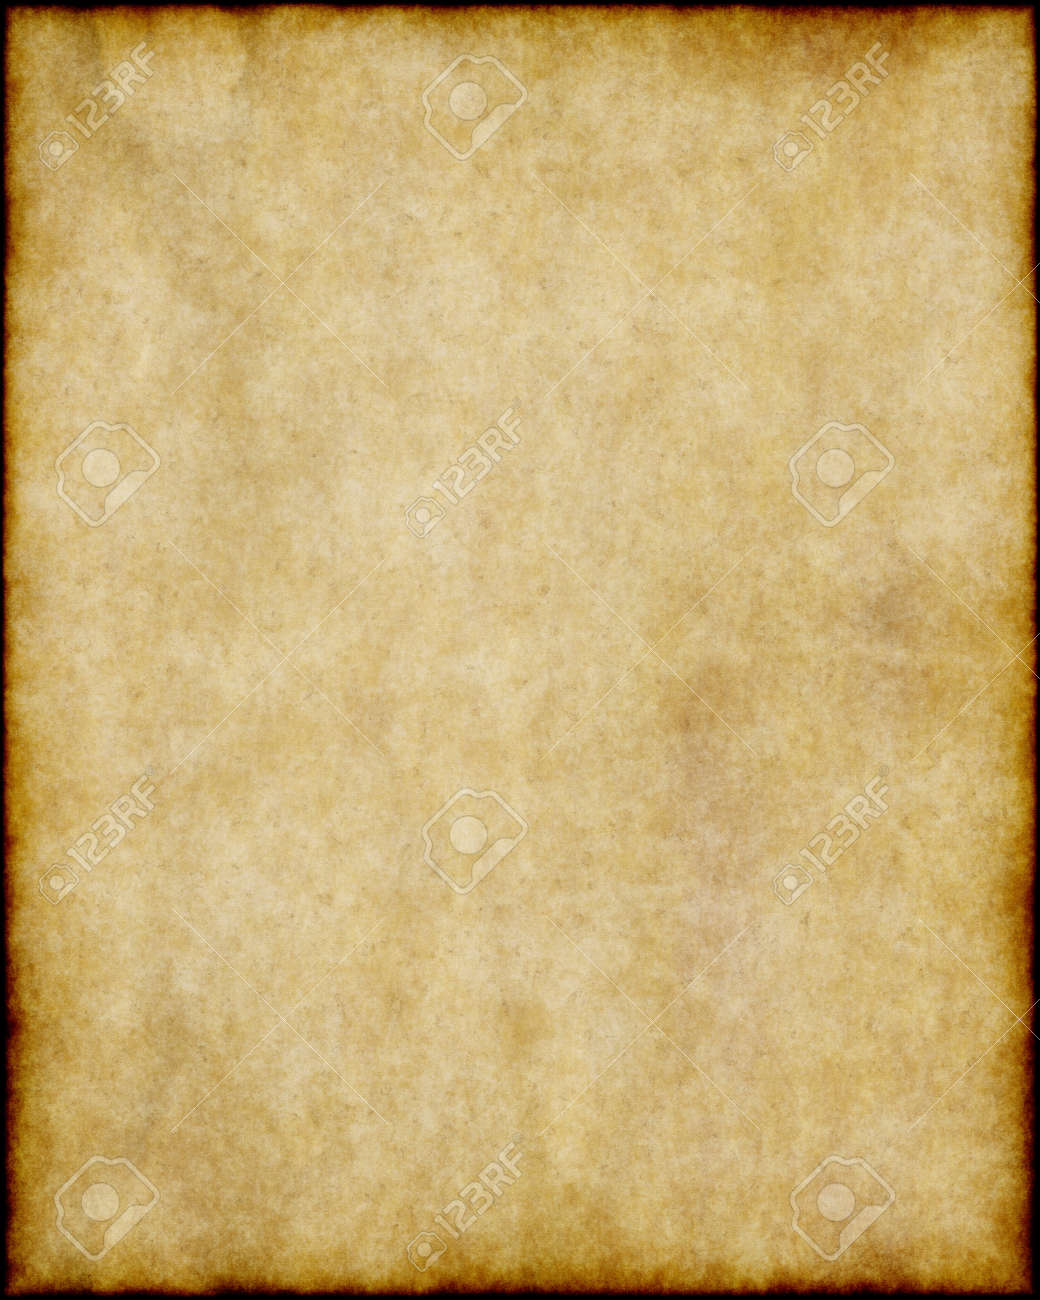 old worn parchment paper